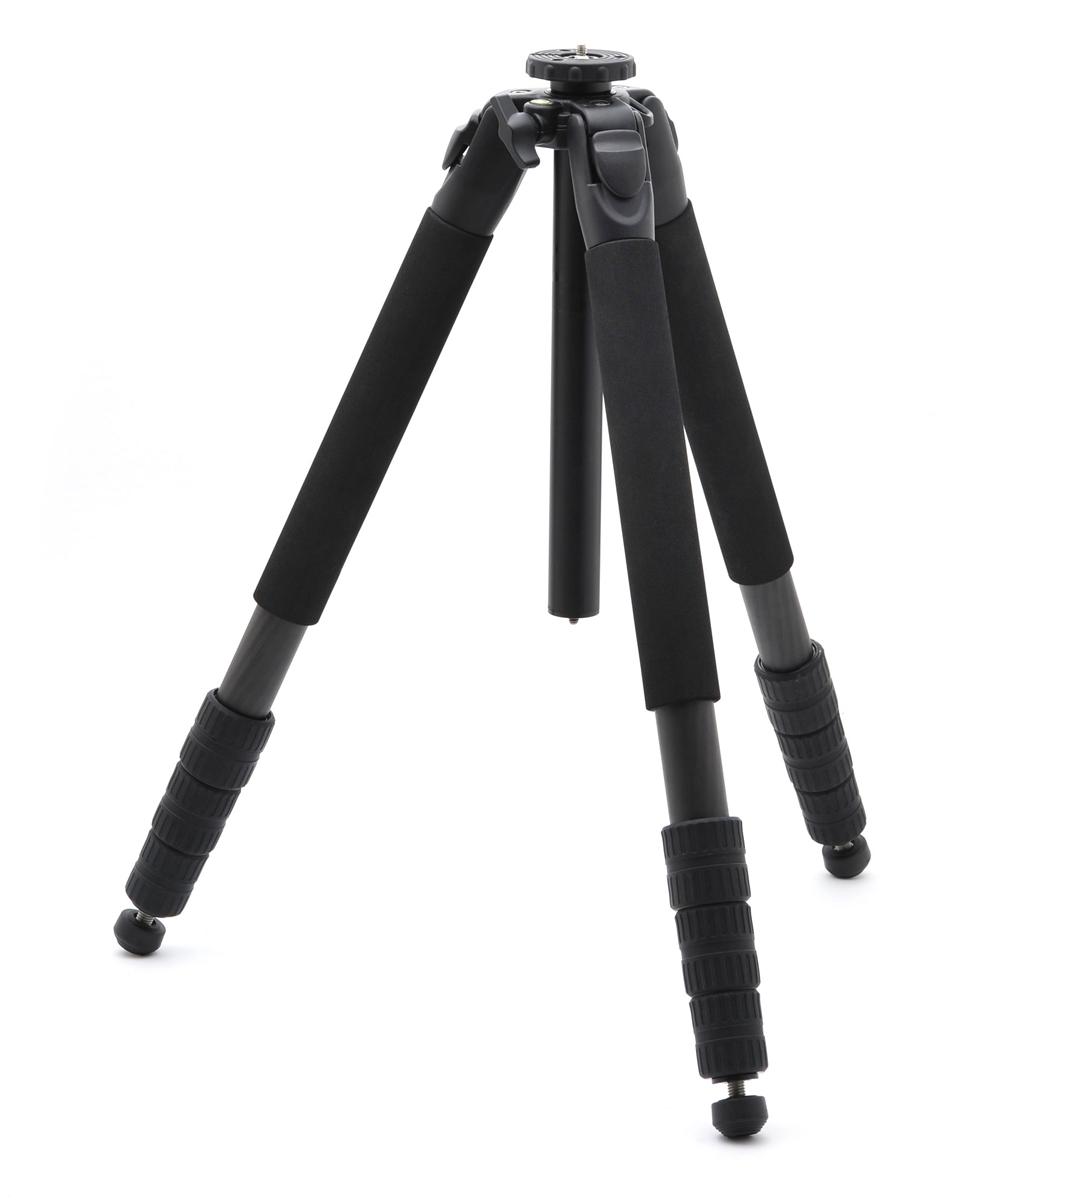 SLIK SCシリーズ SC 704 カーボン(脚のみ) 大型モデル4段三脚『1~3営業日後の発送予定』操作部を大きく快適操作「SCシリーズ」で大型タイプのカーボン4段三脚!パイプ径32mm4段で300mmF2.8など大口径超望遠レンズに対応【smtb-TK】[fs04gm][P19Jul15]